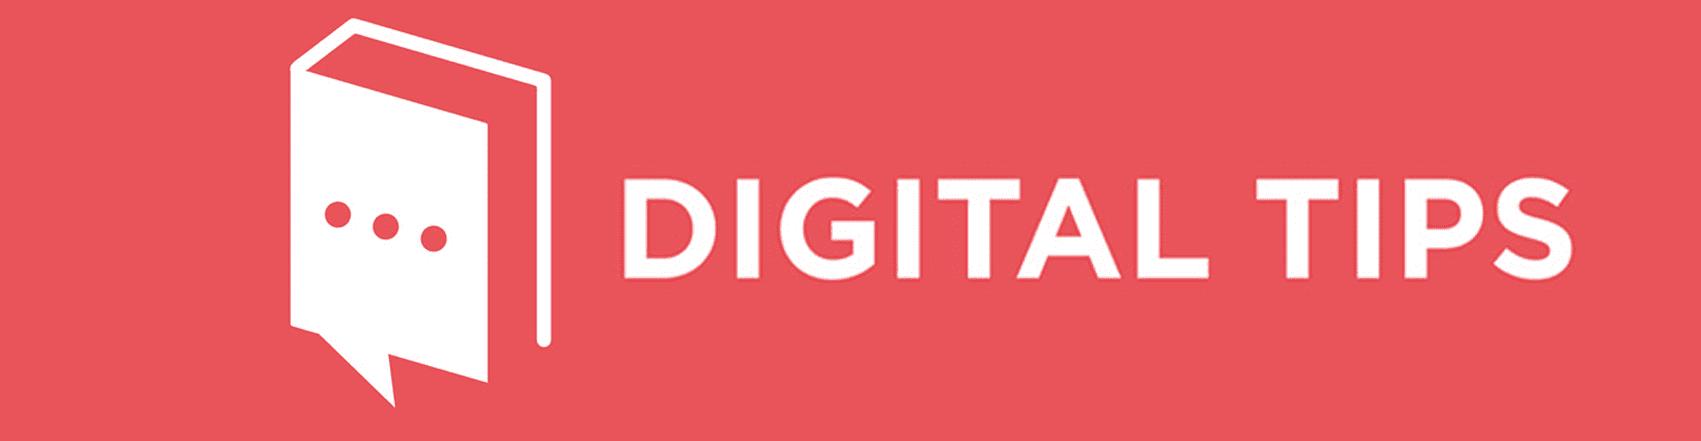 digitaltips